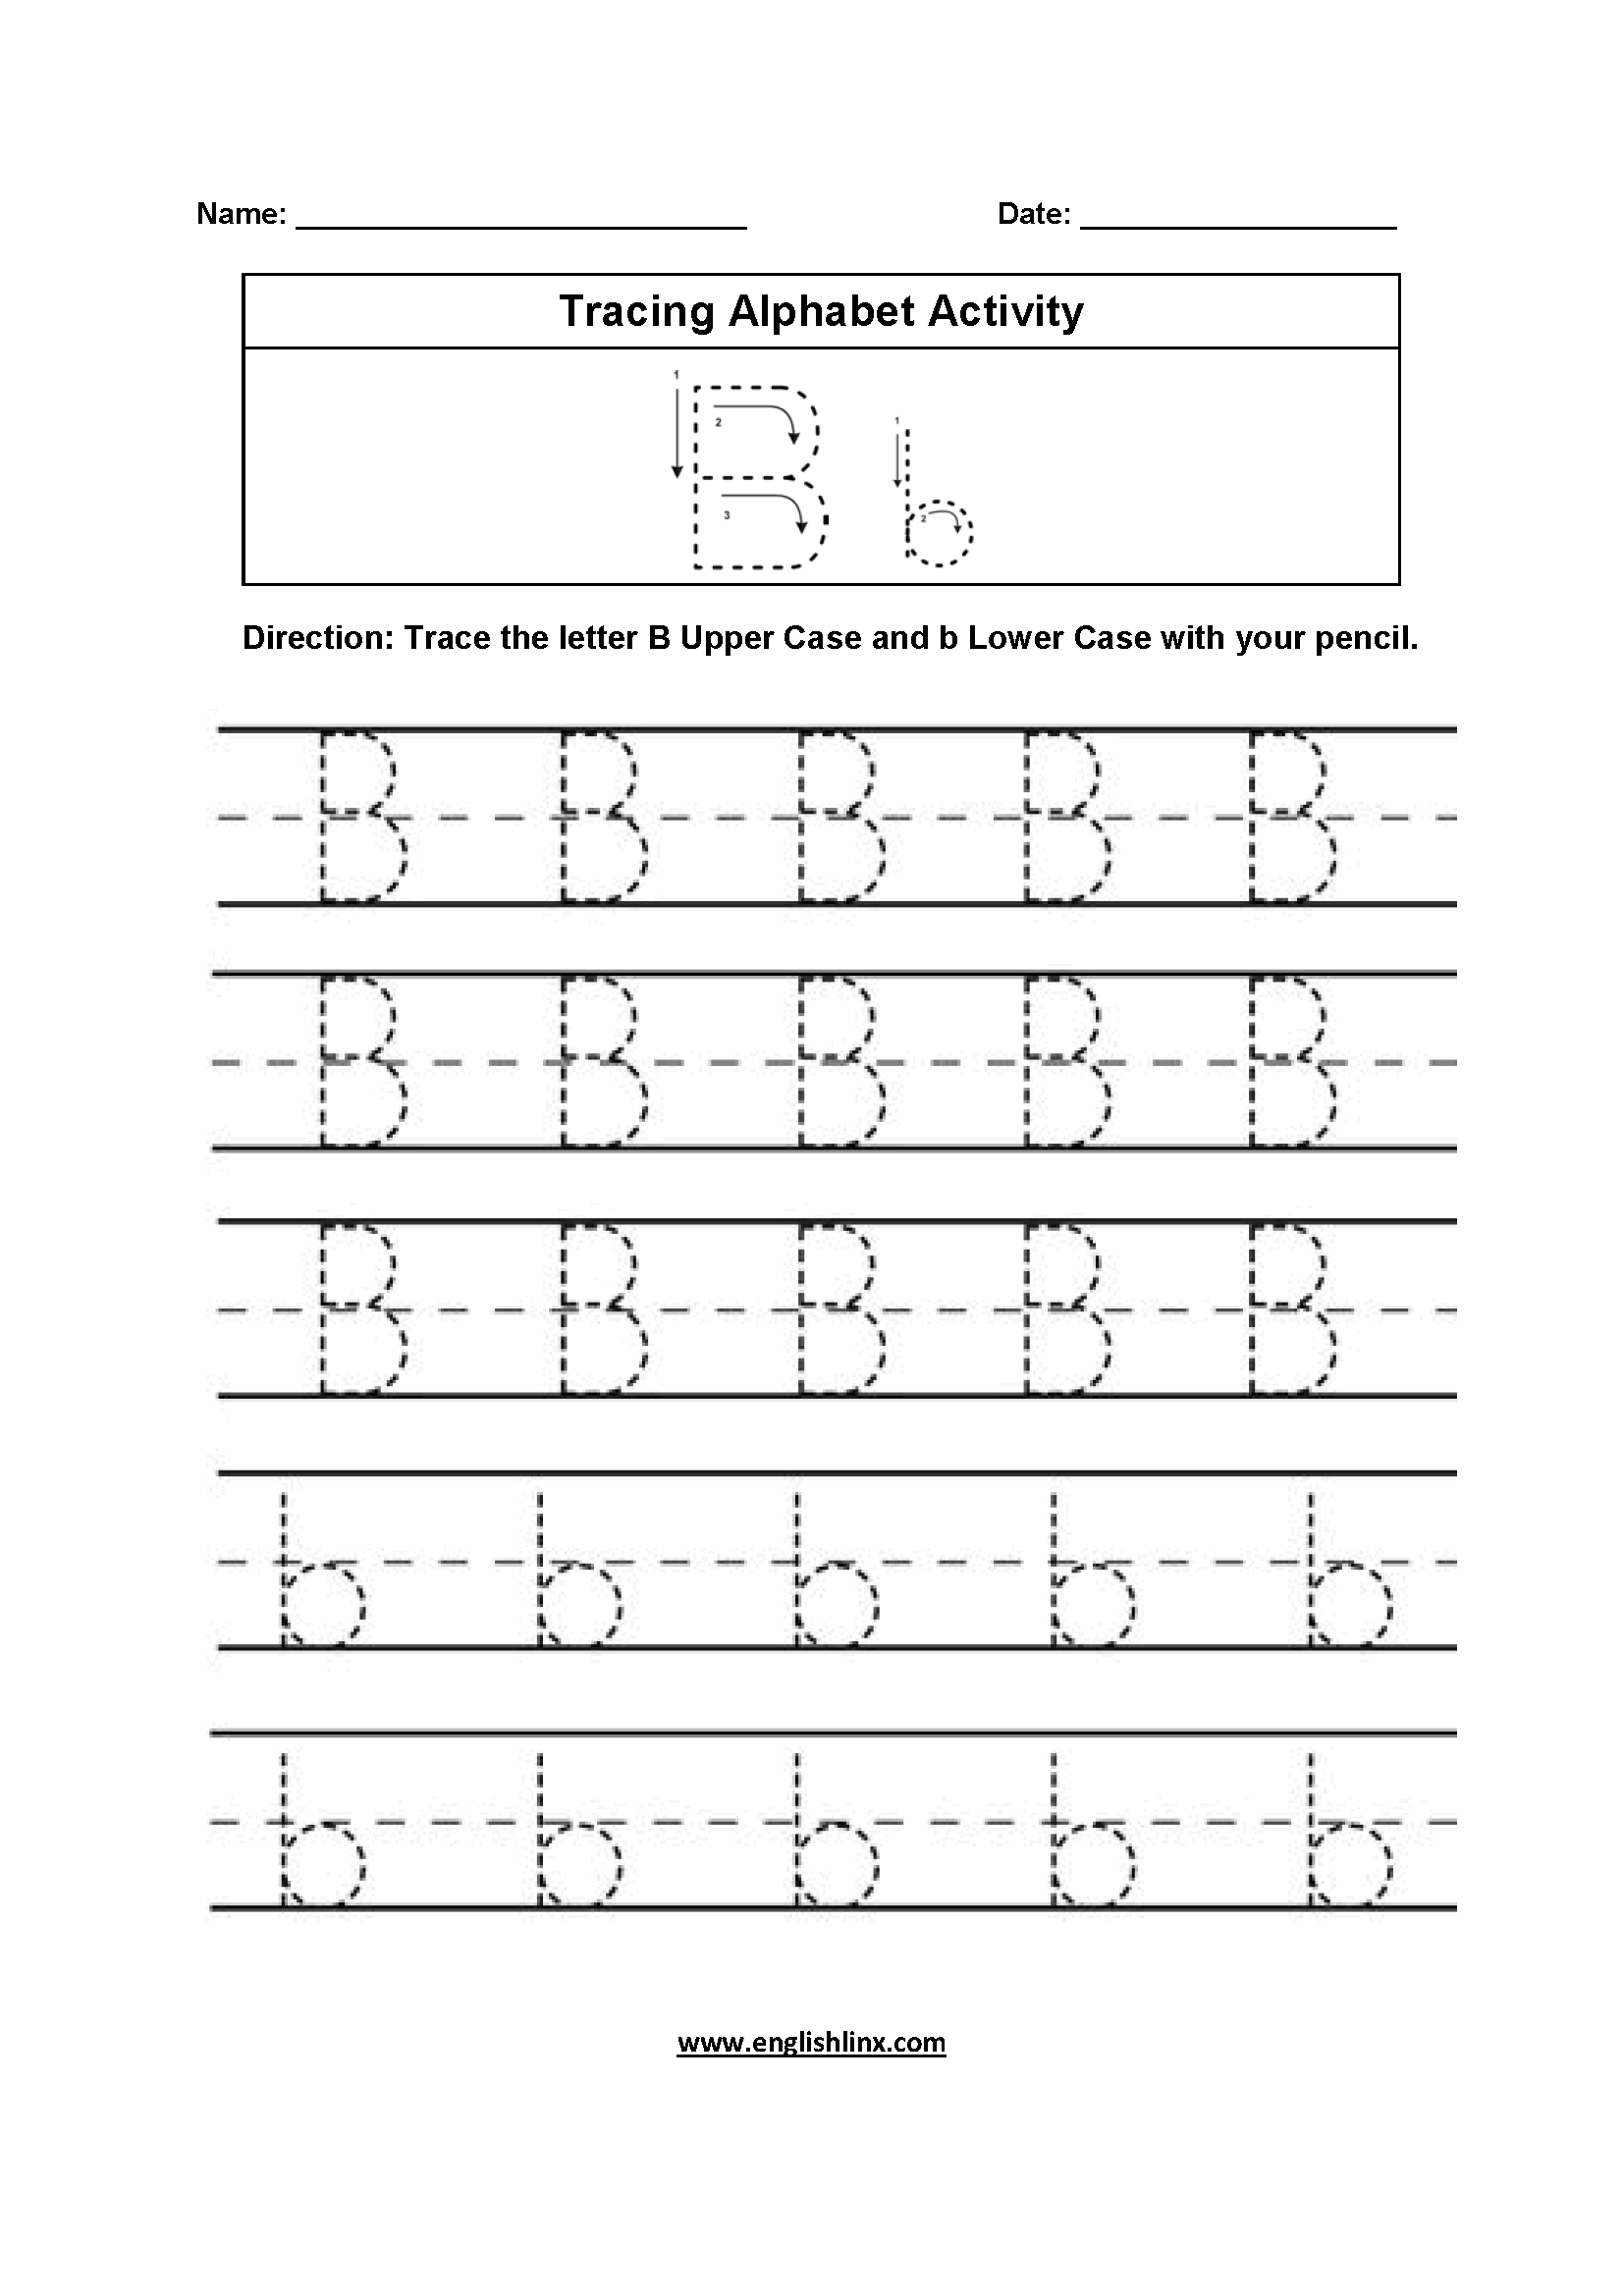 Alphabet Worksheets | Tracing Alphabet Worksheets regarding Letter B Tracing Sheet